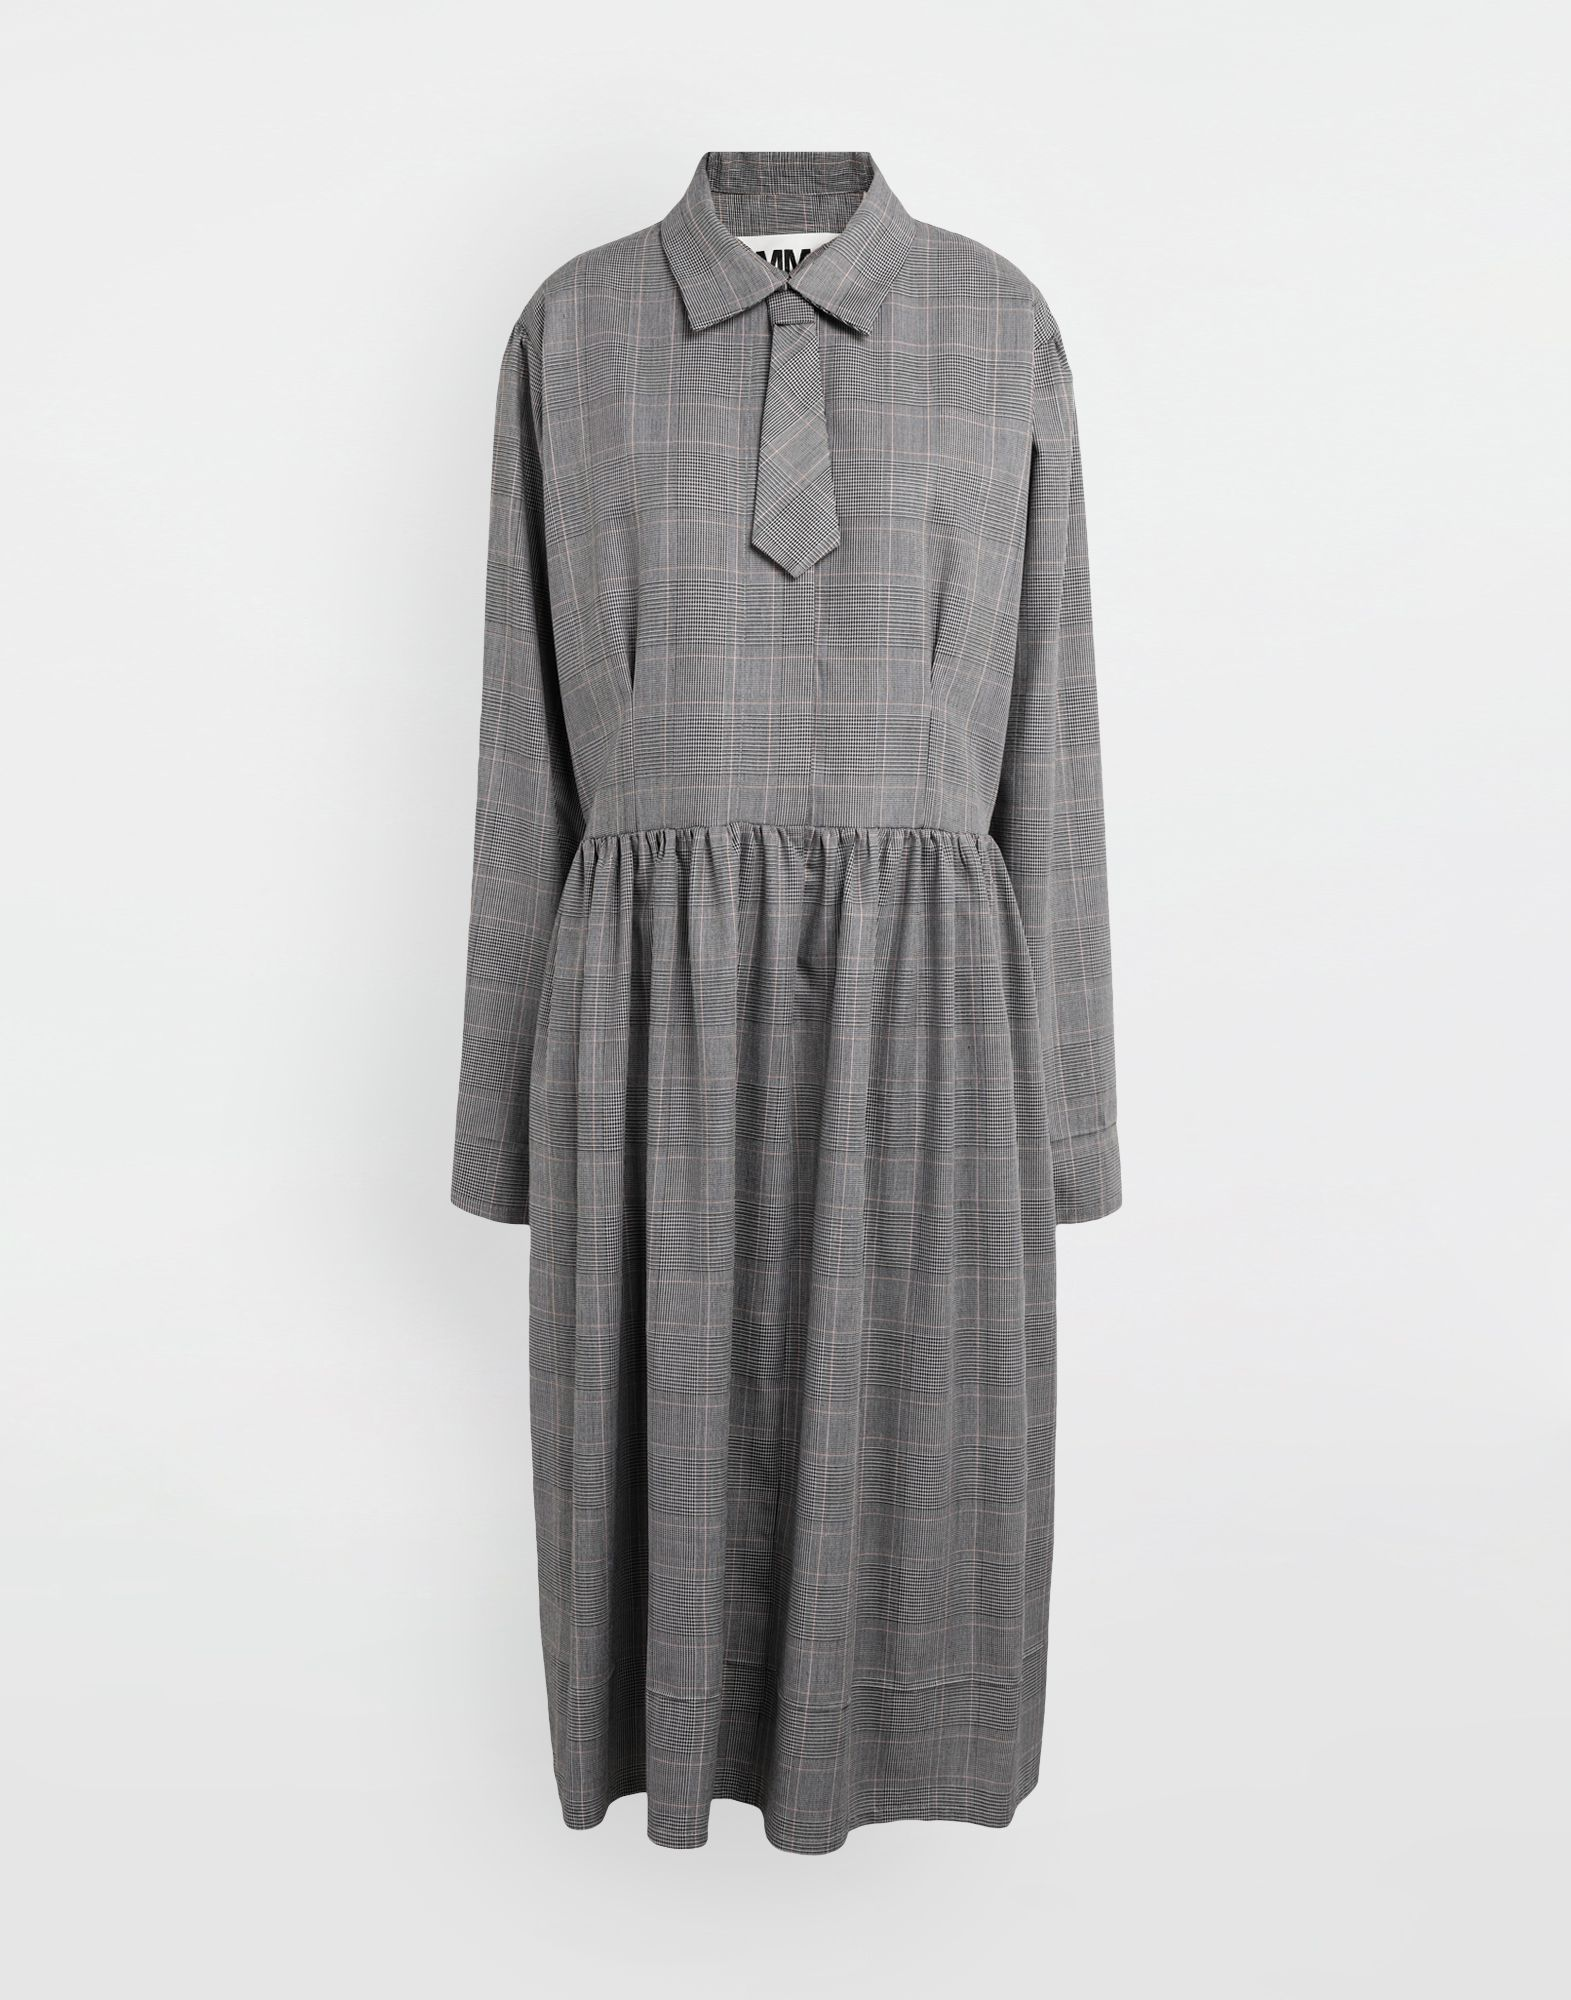 MM6 MAISON MARGIELA Checked necktie maxi dress 3/4 length dress Woman f